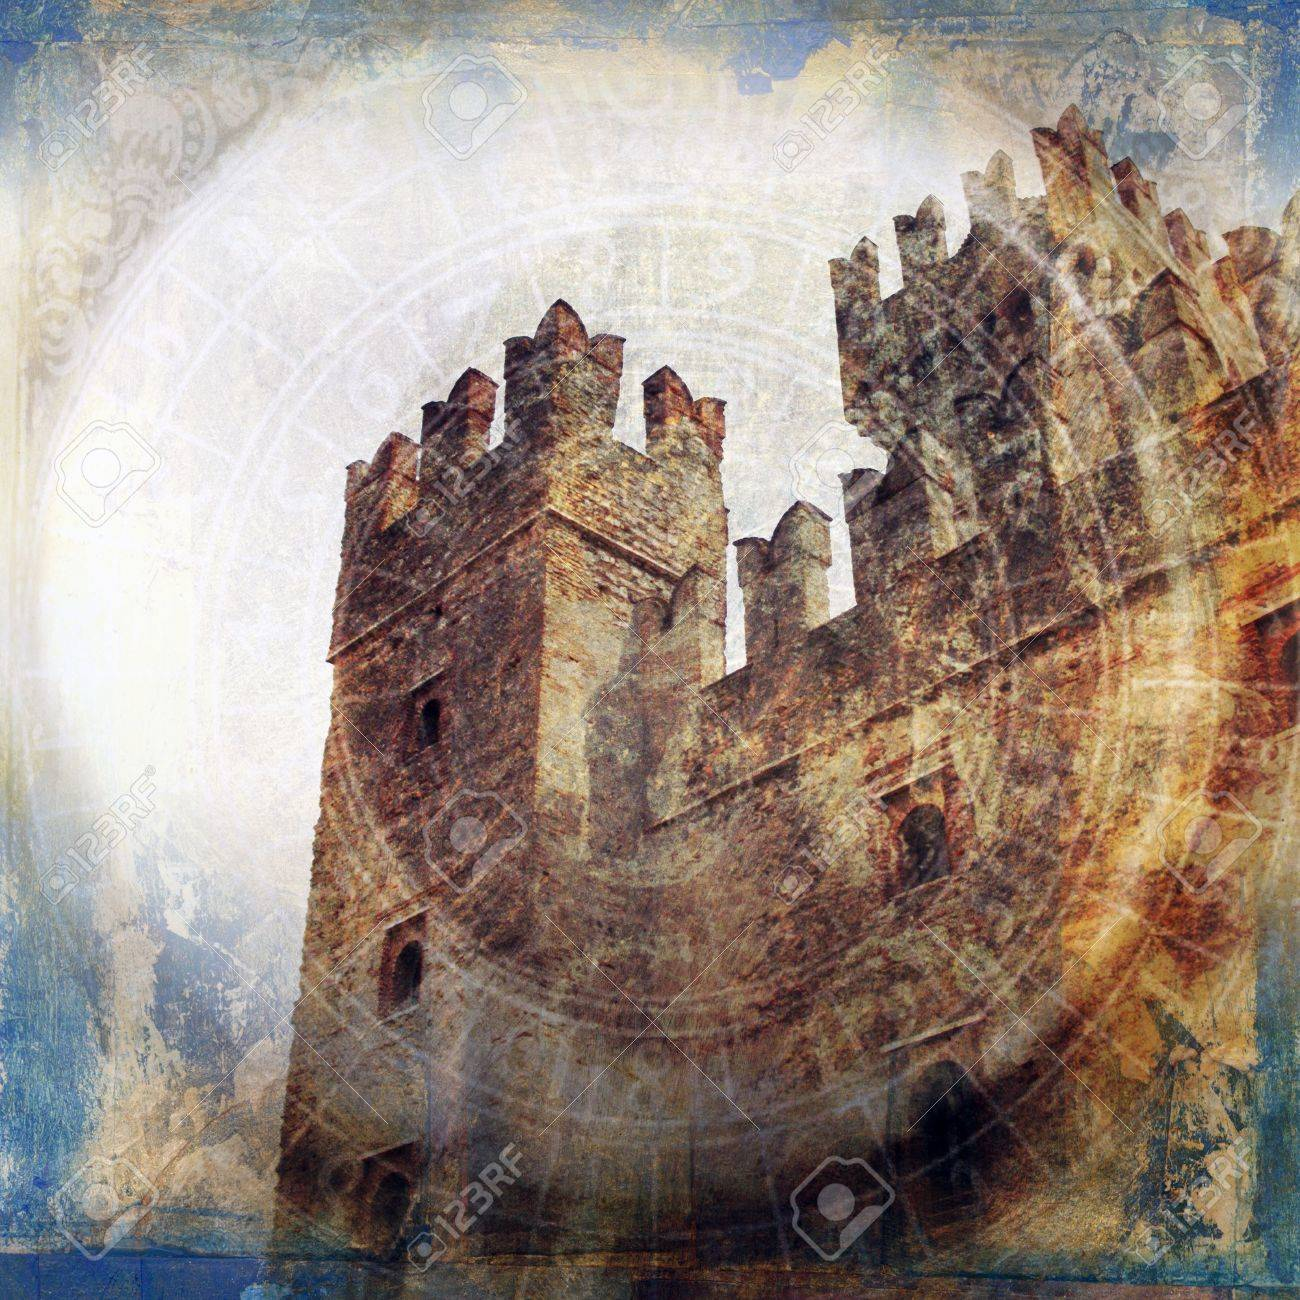 Midieval fortress. Photo based illustration. - 5169123